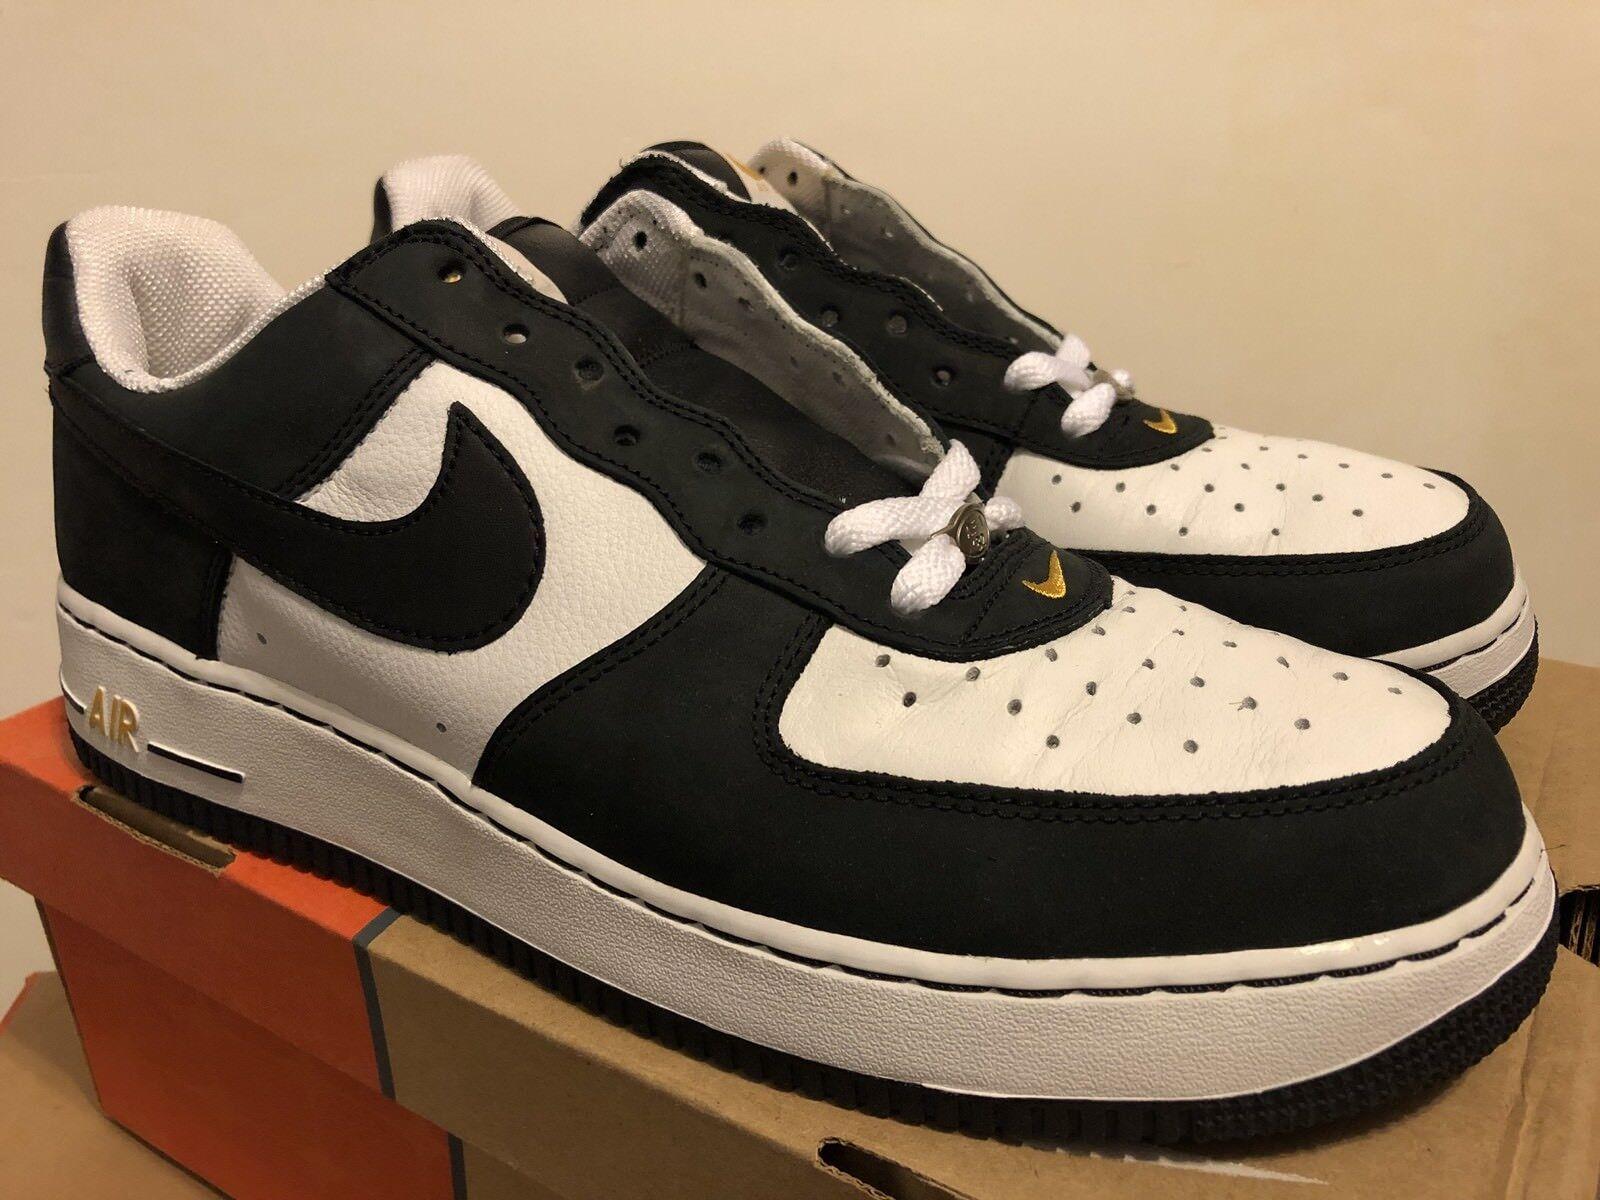 Nike Air Force 1 JD Sports White / Nero / Sport Gold 2004 Sz 12 DEAD STOCK